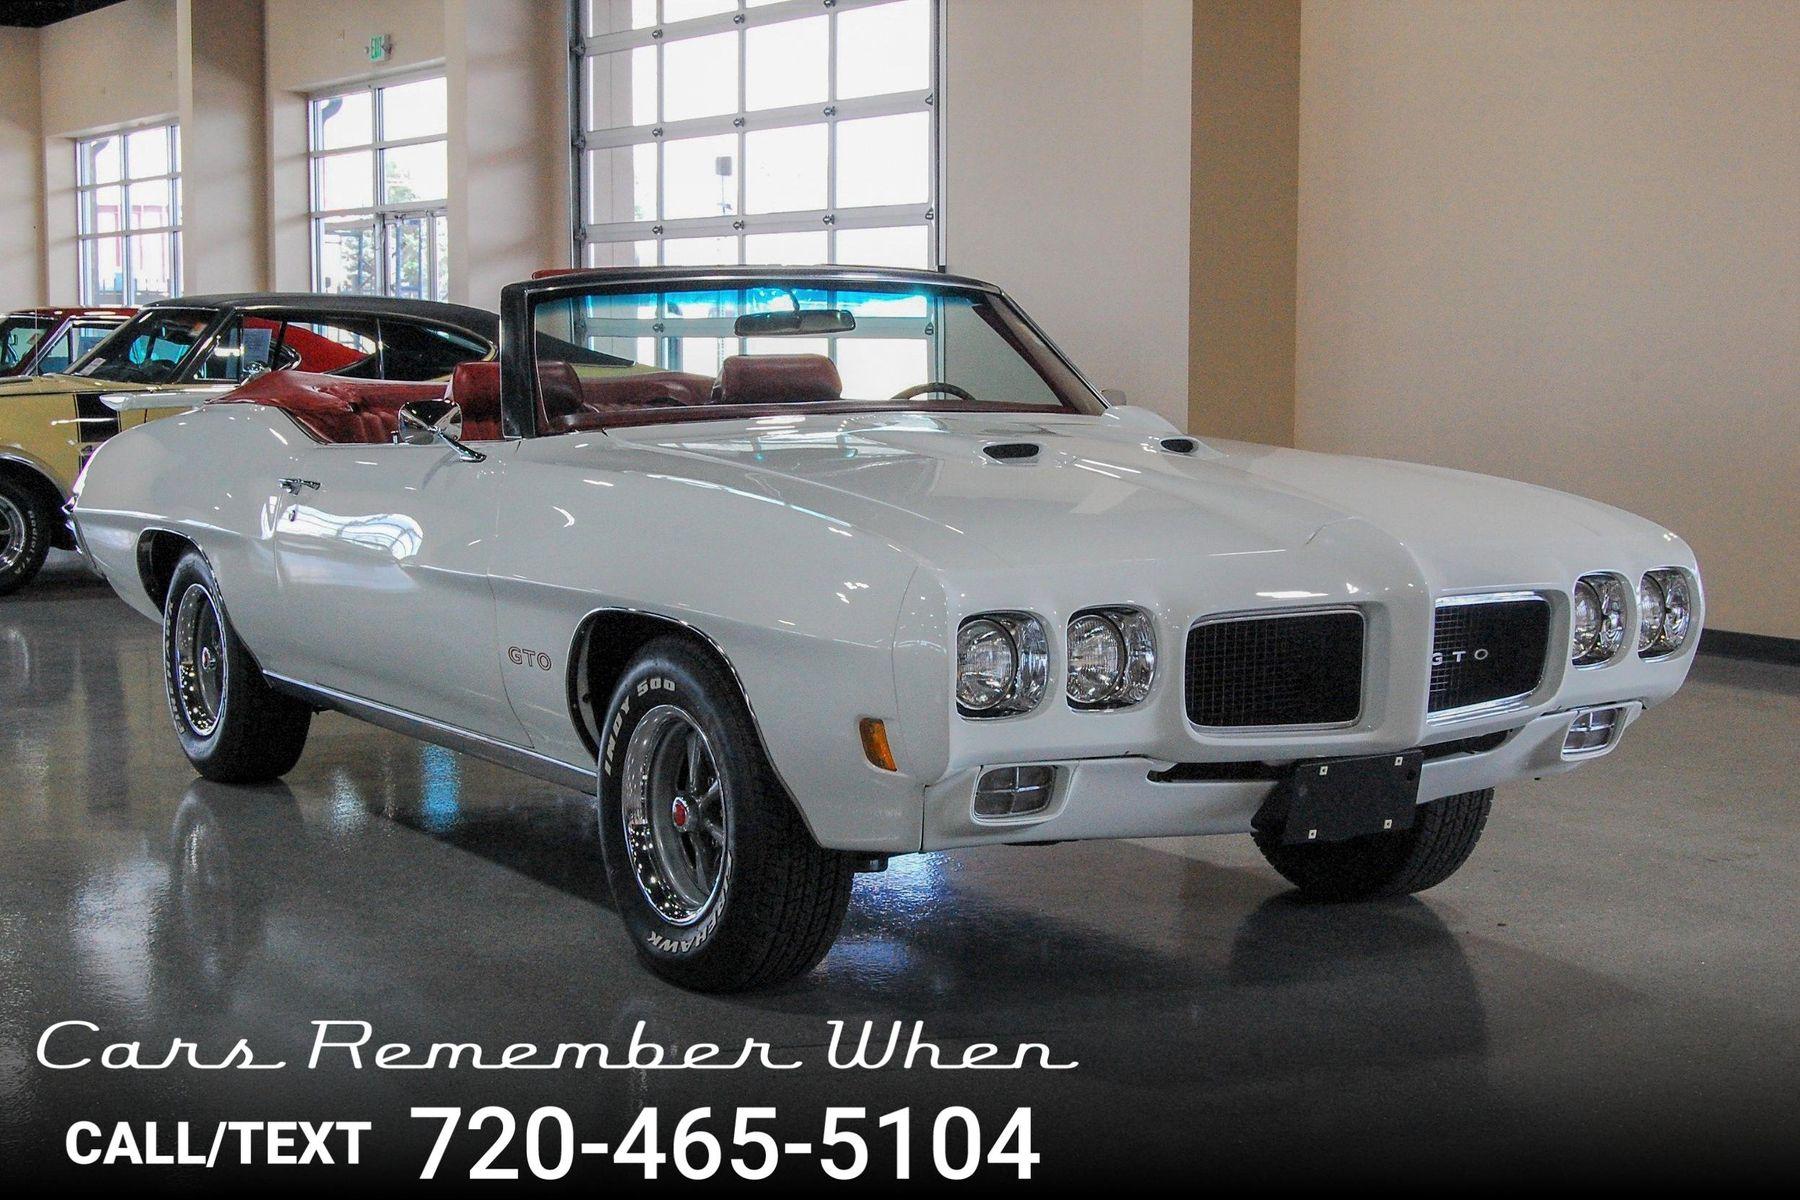 1970 Pontiac GTO Convertible | Cars Remember When